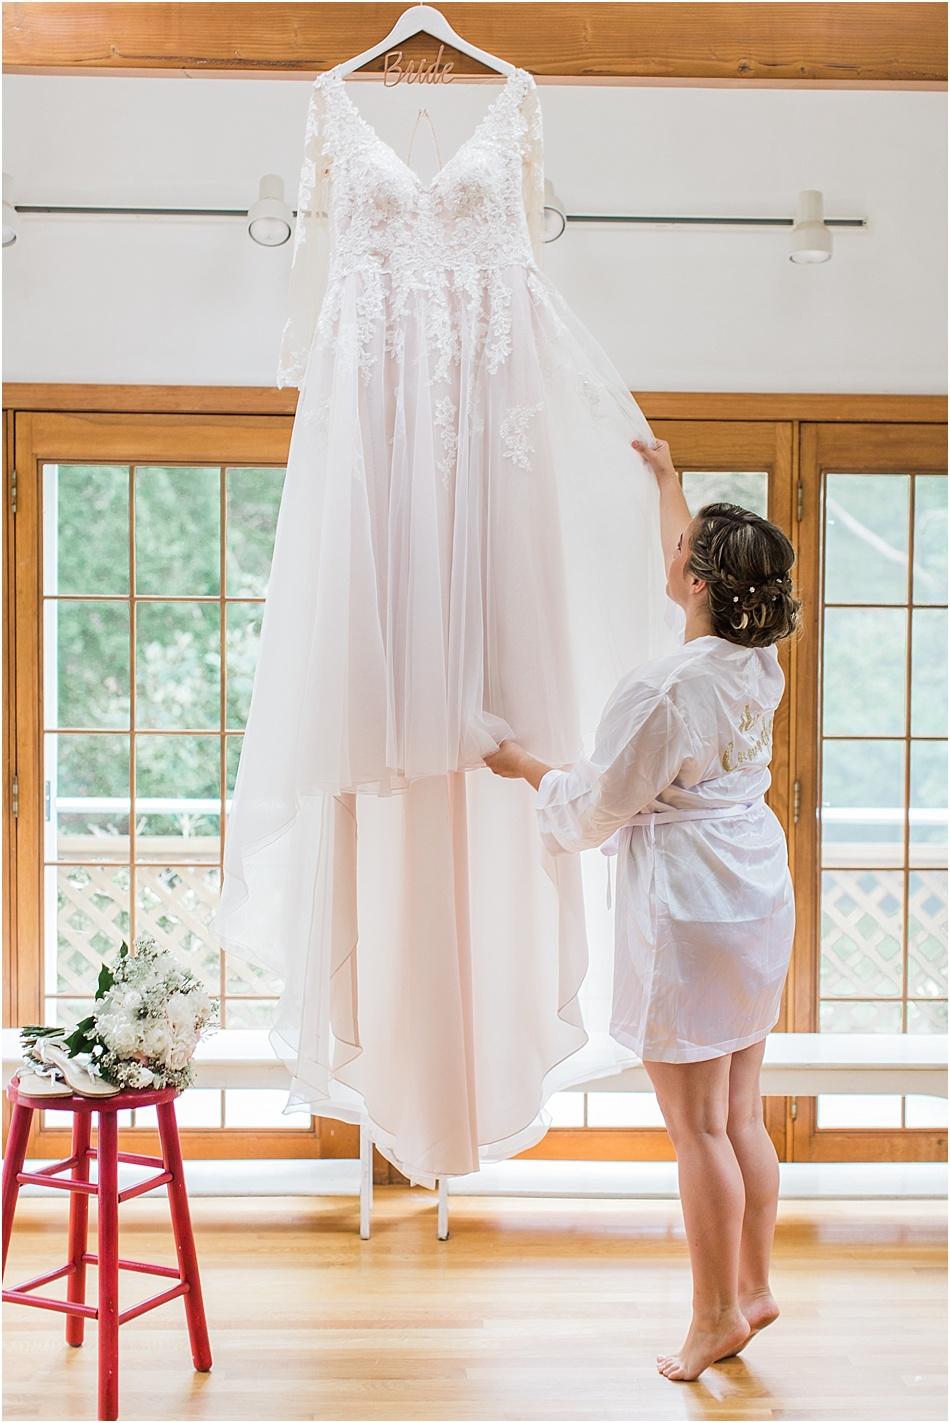 brookside_country_club_cape_cod_boston_wedding_photographer_Meredith_Jane_Photography_photo_0123.jpg